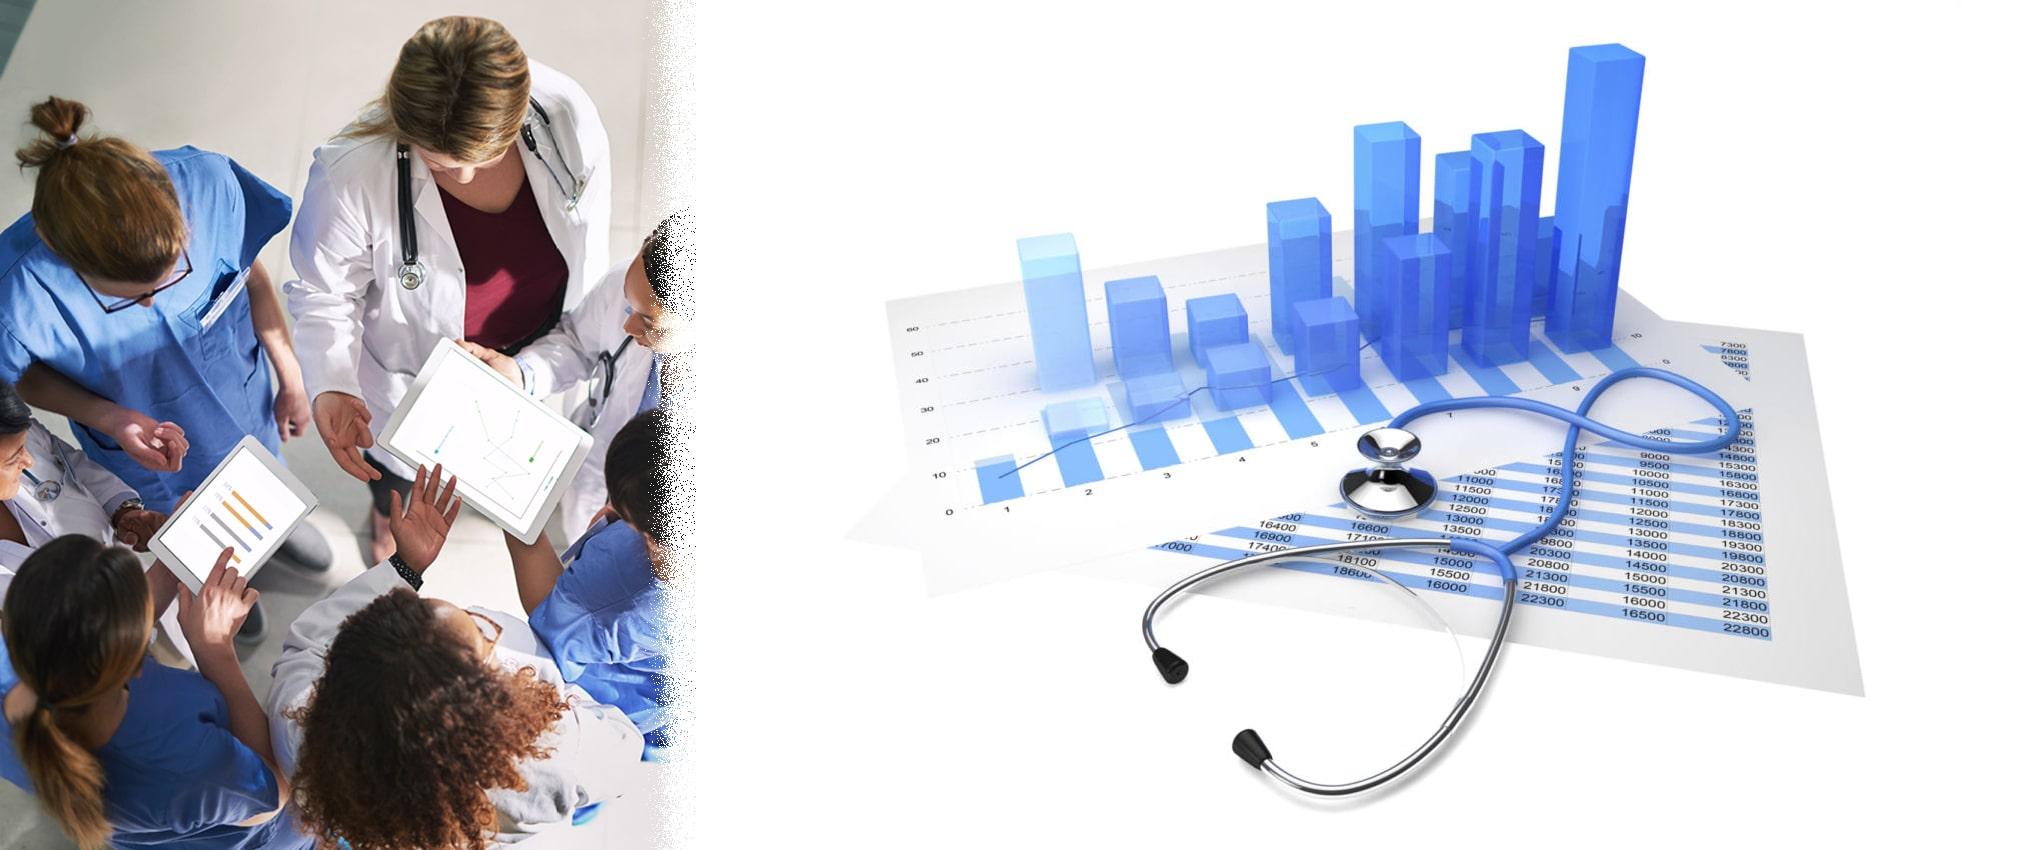 healthcare analytics market 2021 trending technologies